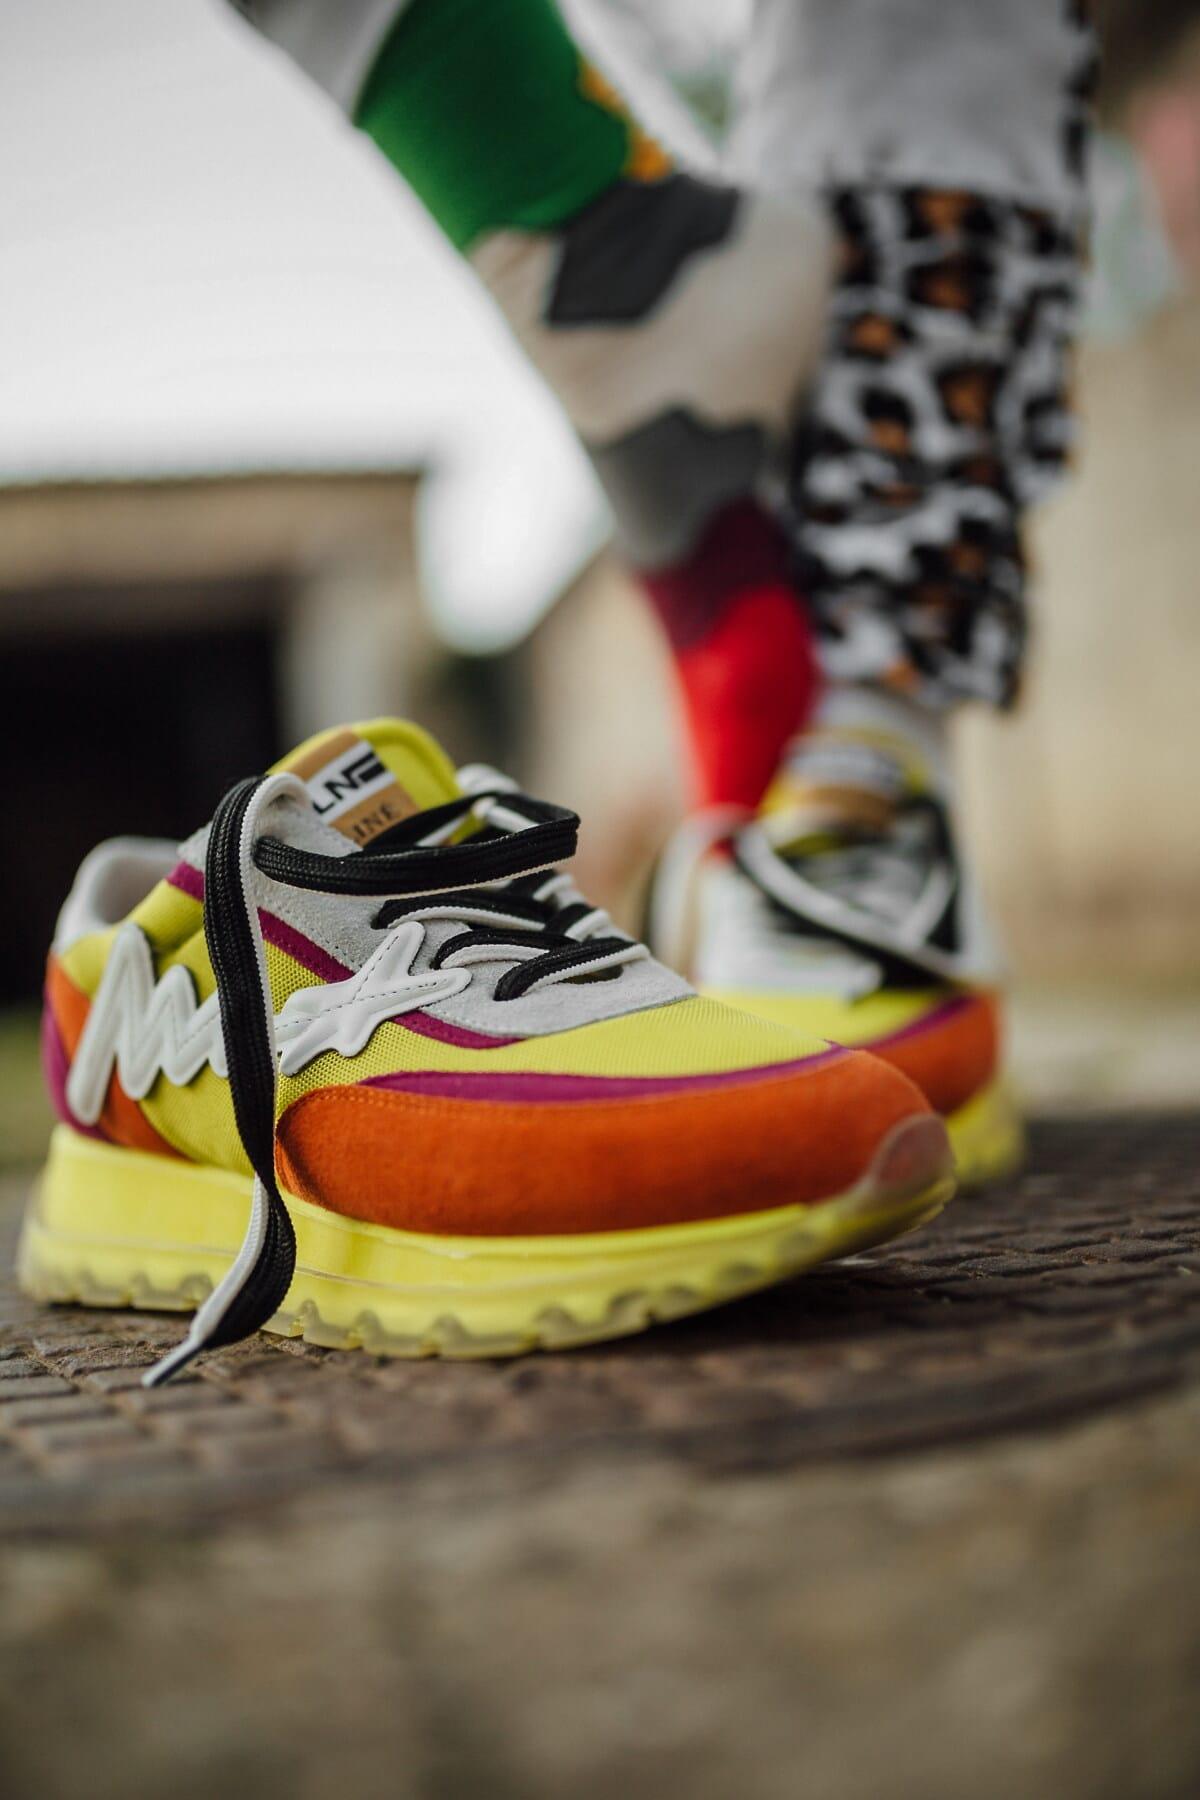 colorful, sneakers, legs, sock, footwear, foot, blur, fashion, woman, outdoors